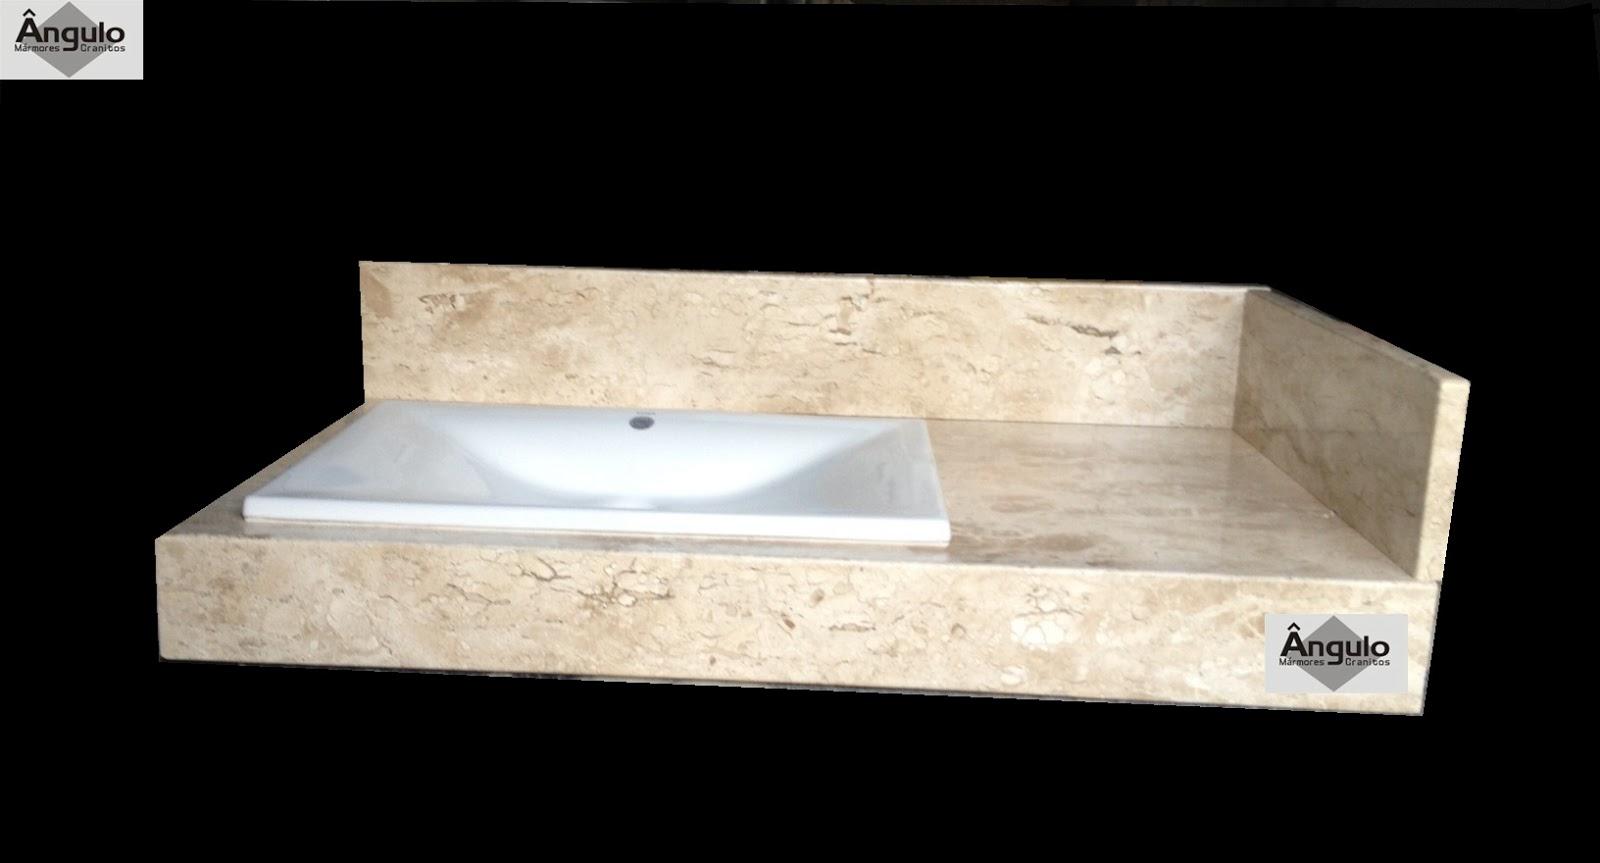 Ângulo Mármores e Granitos: Bancada Para Banheiro Bege Bahia #836F48 1600x863 Banheiro Bancada Bege Bahia